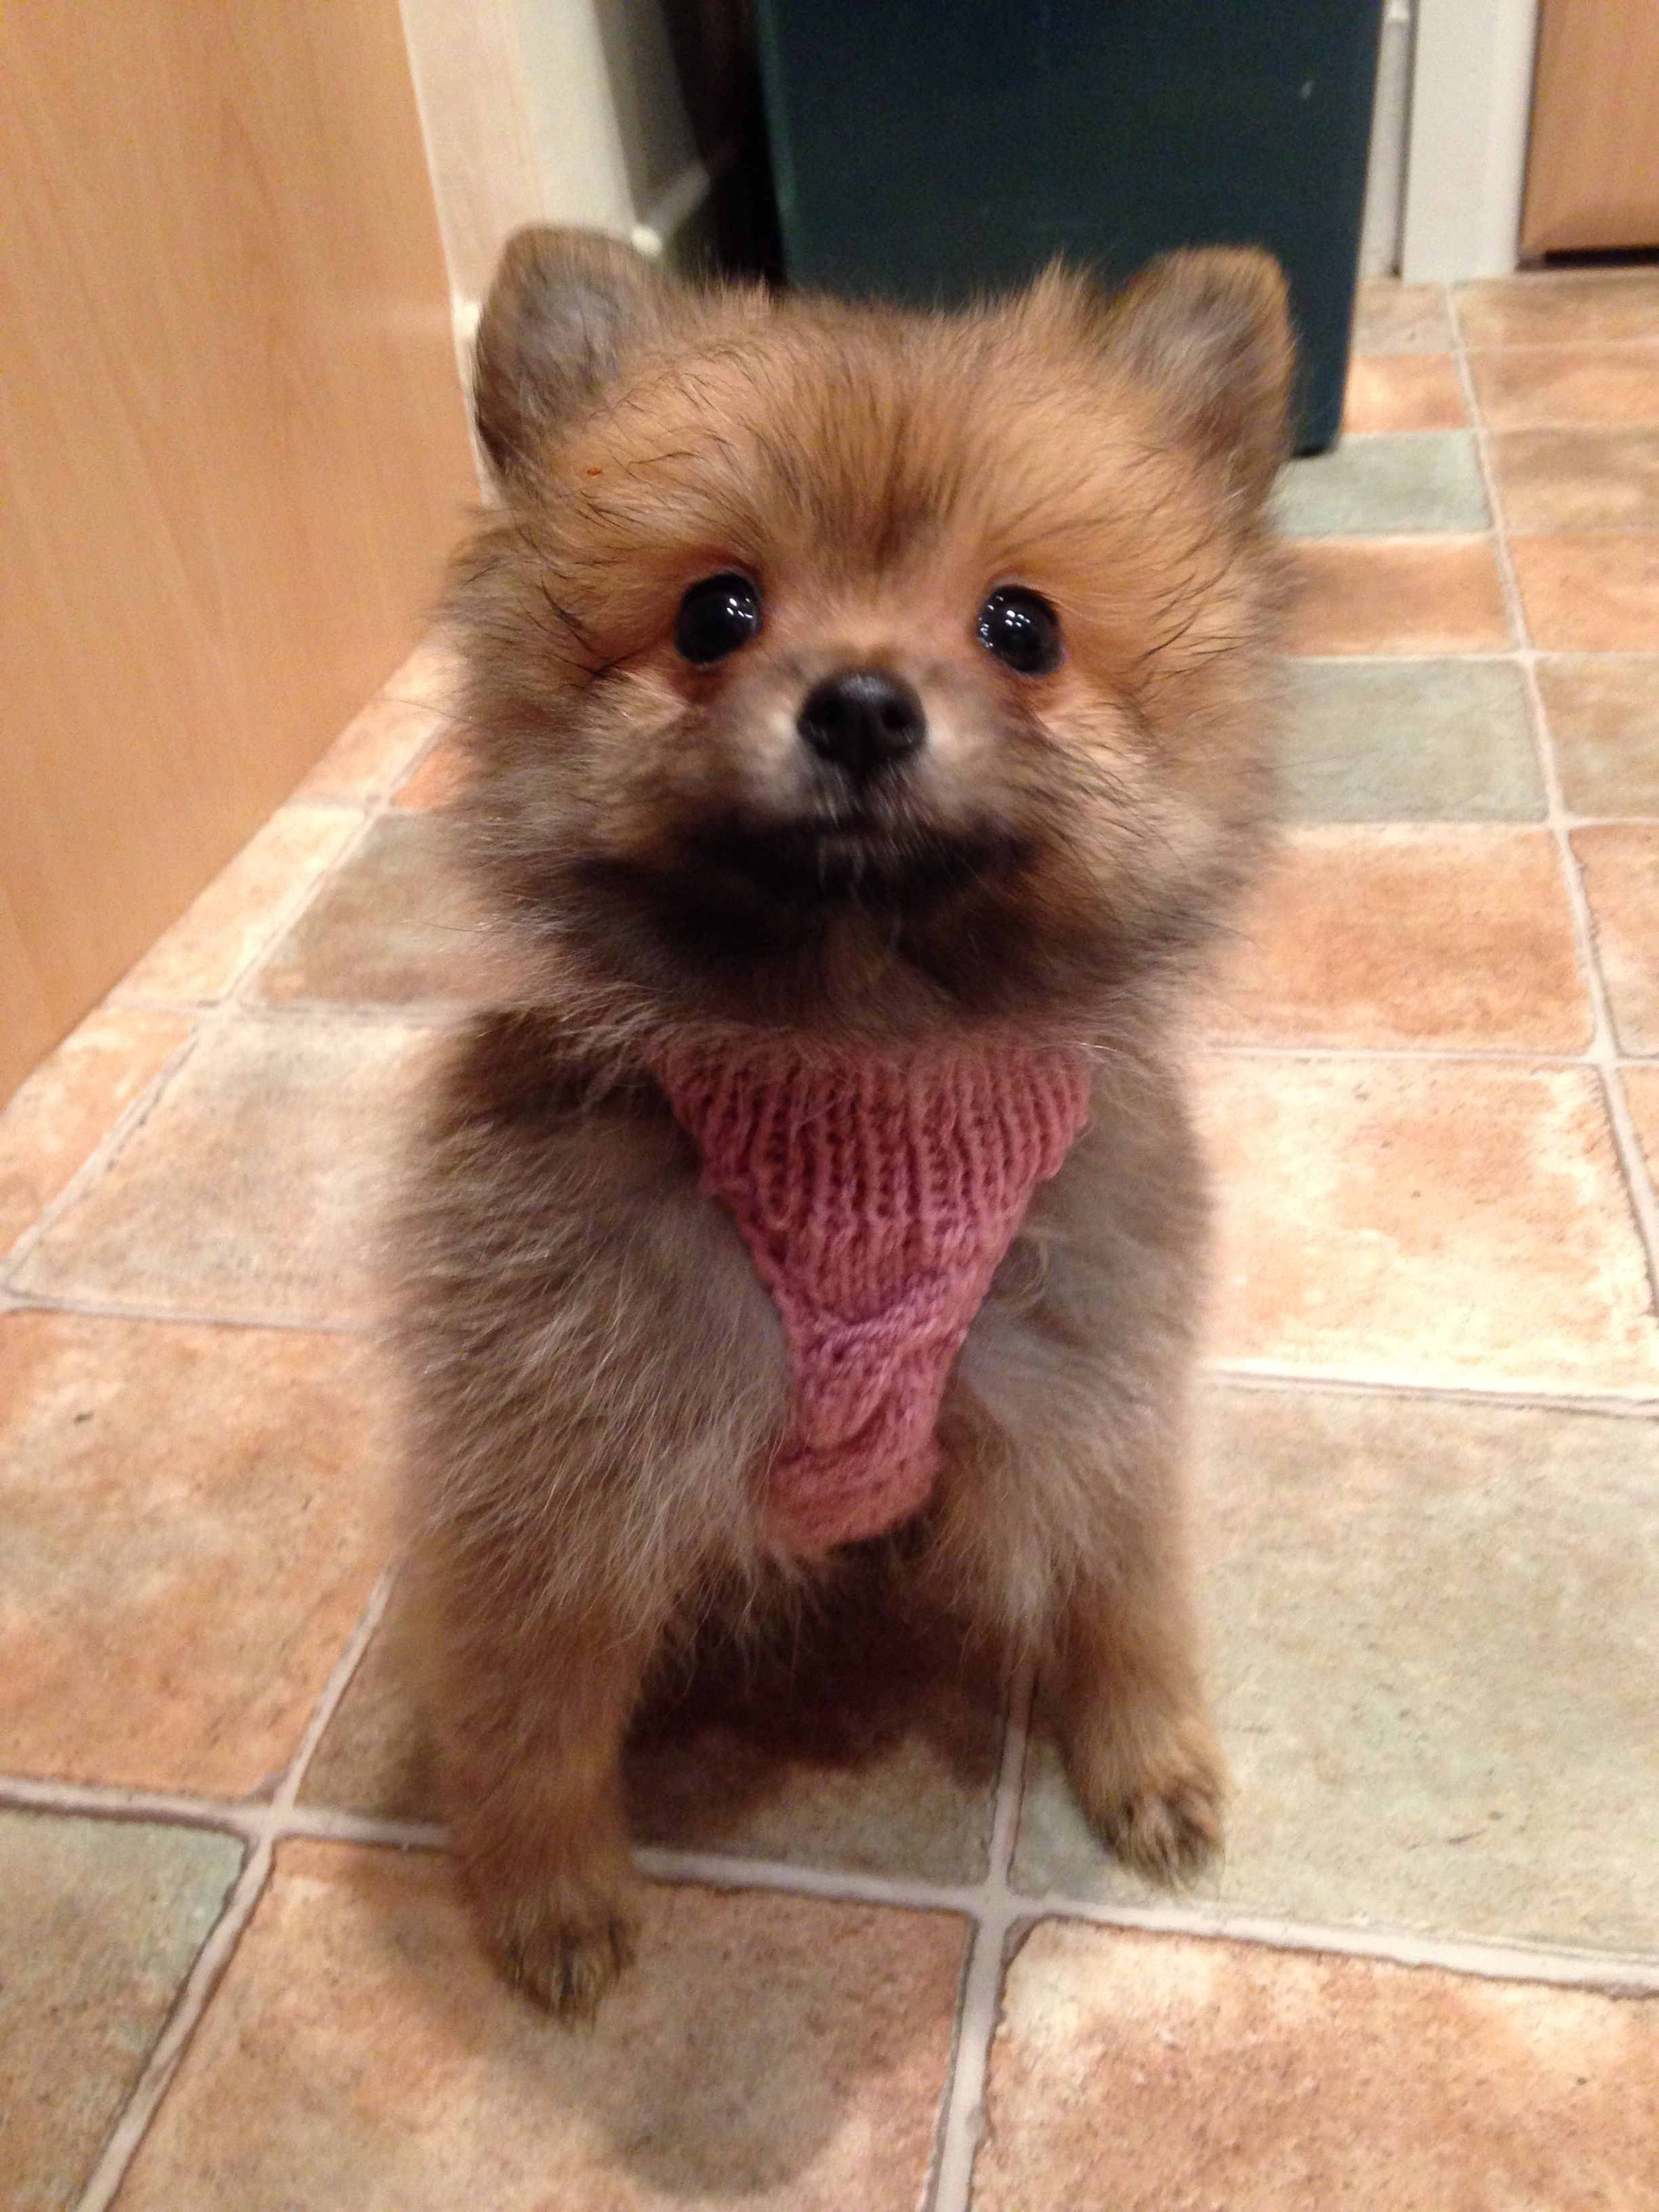 Pomeranian Puppy knitwear Pomeranian Pomeranian puppy